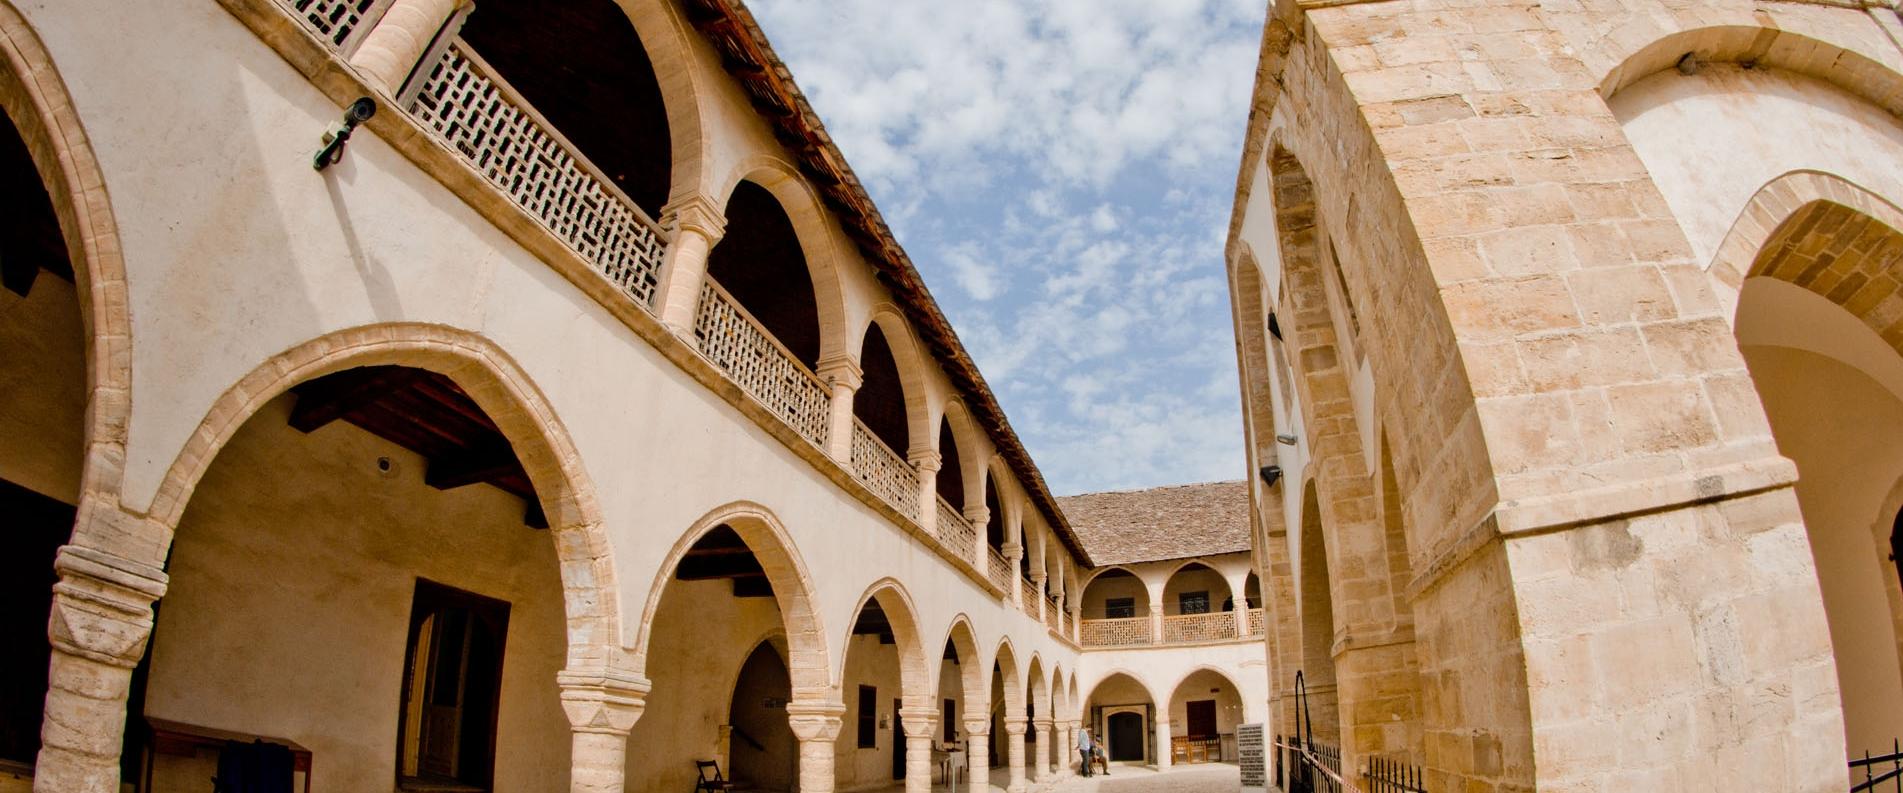 Timios Stavros Monastery, Odomos, Photo essay